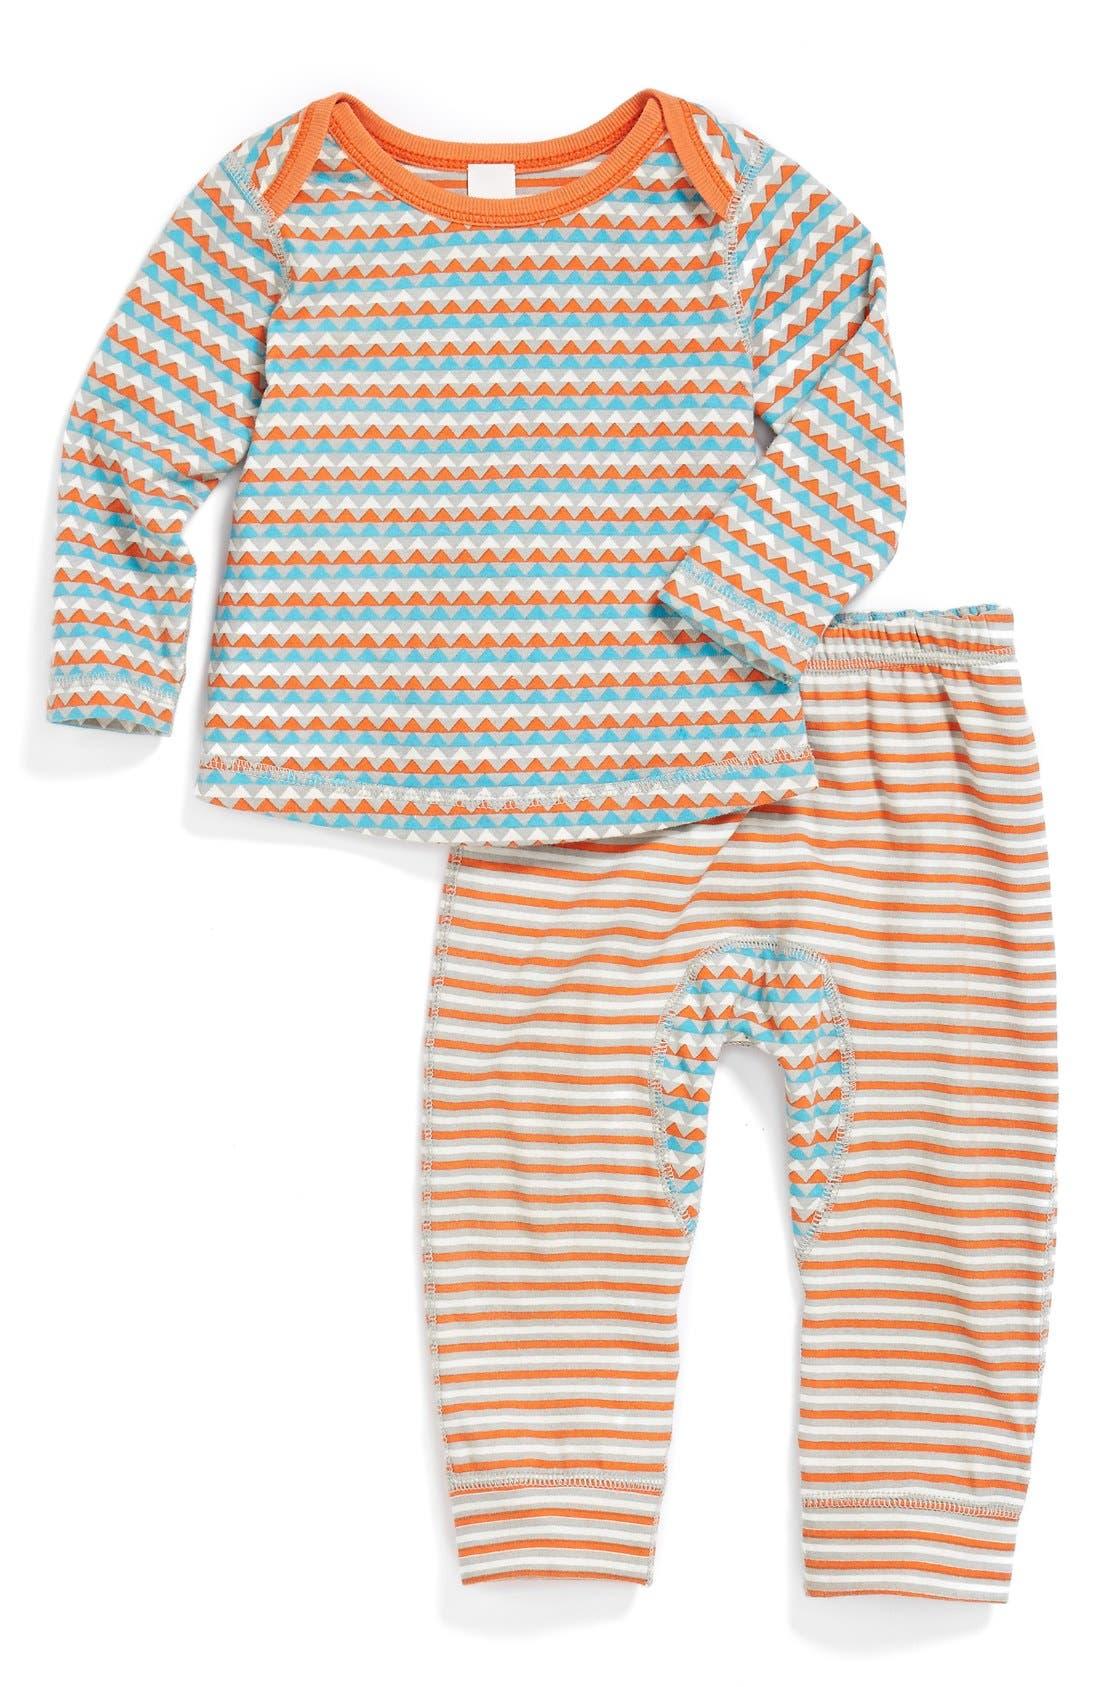 Main Image - Stem Baby Reversible Organic Cotton T-Shirt & Pants (Baby Boys) (Nordstrom Exclusive)